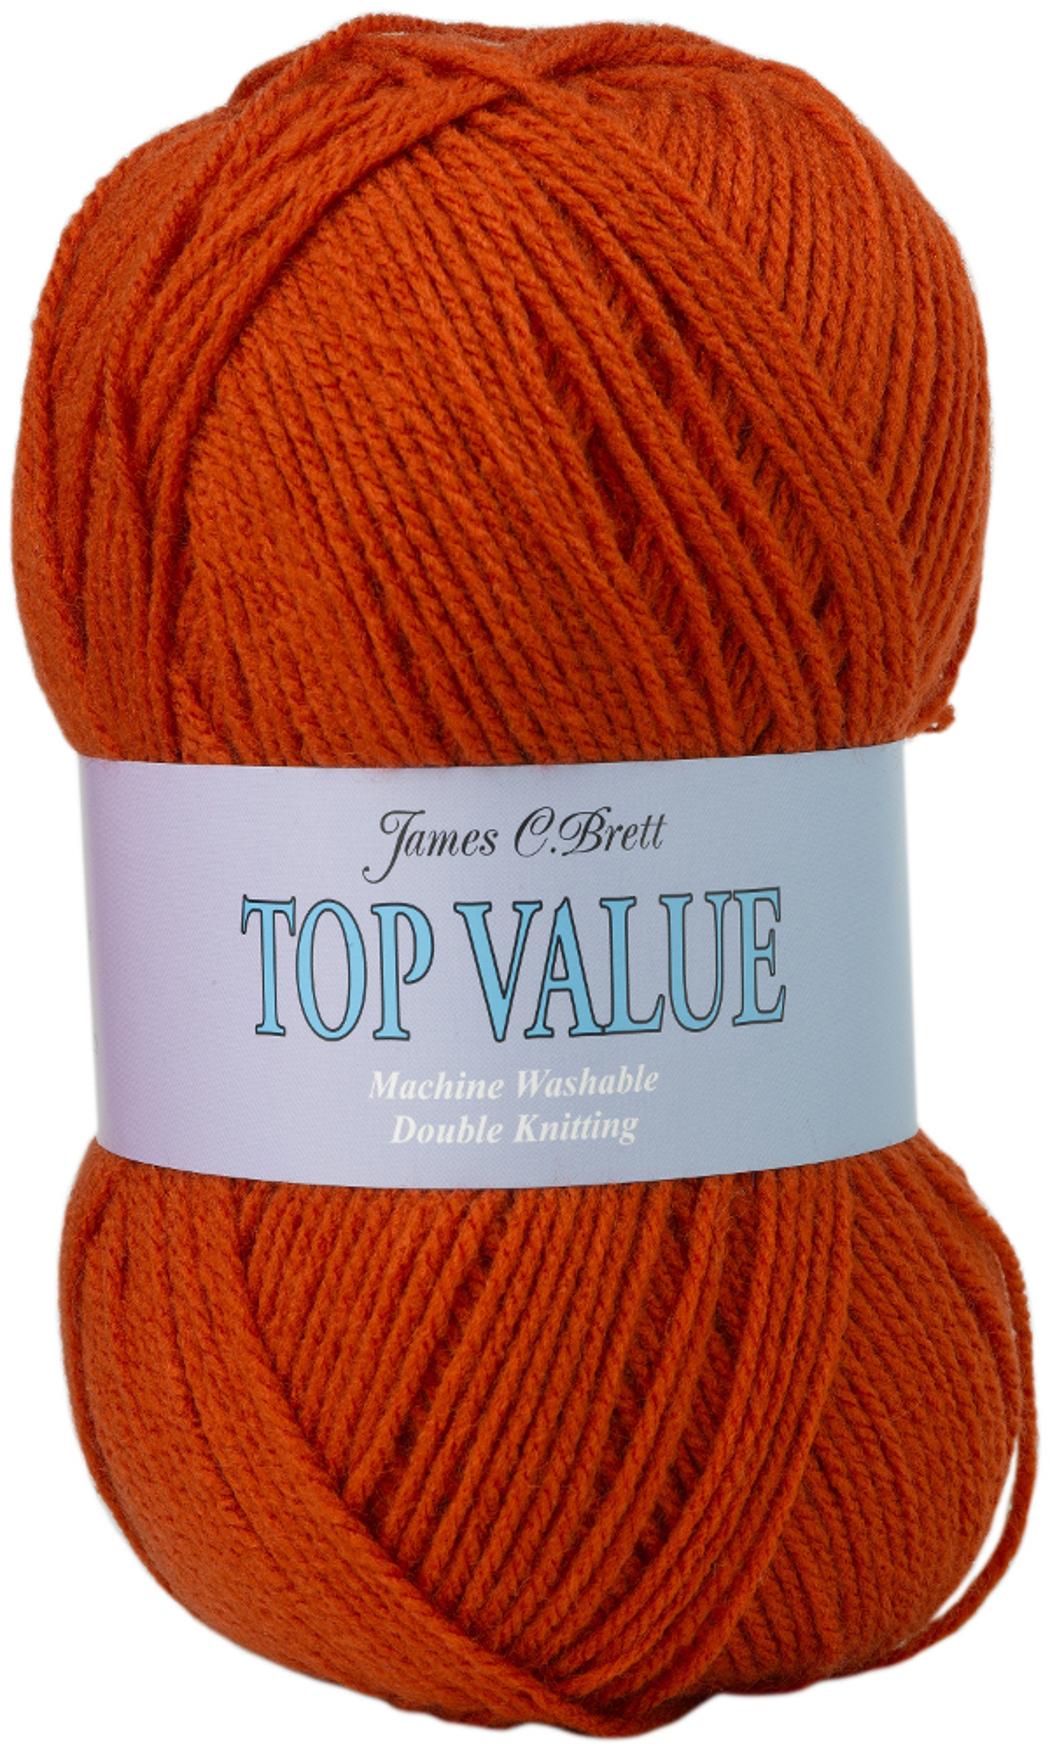 Acrylic Yarn : ... -Top-Value-DK-Machine-Washable-Yarn-100-Acrylic-Double-Knitting-Wool